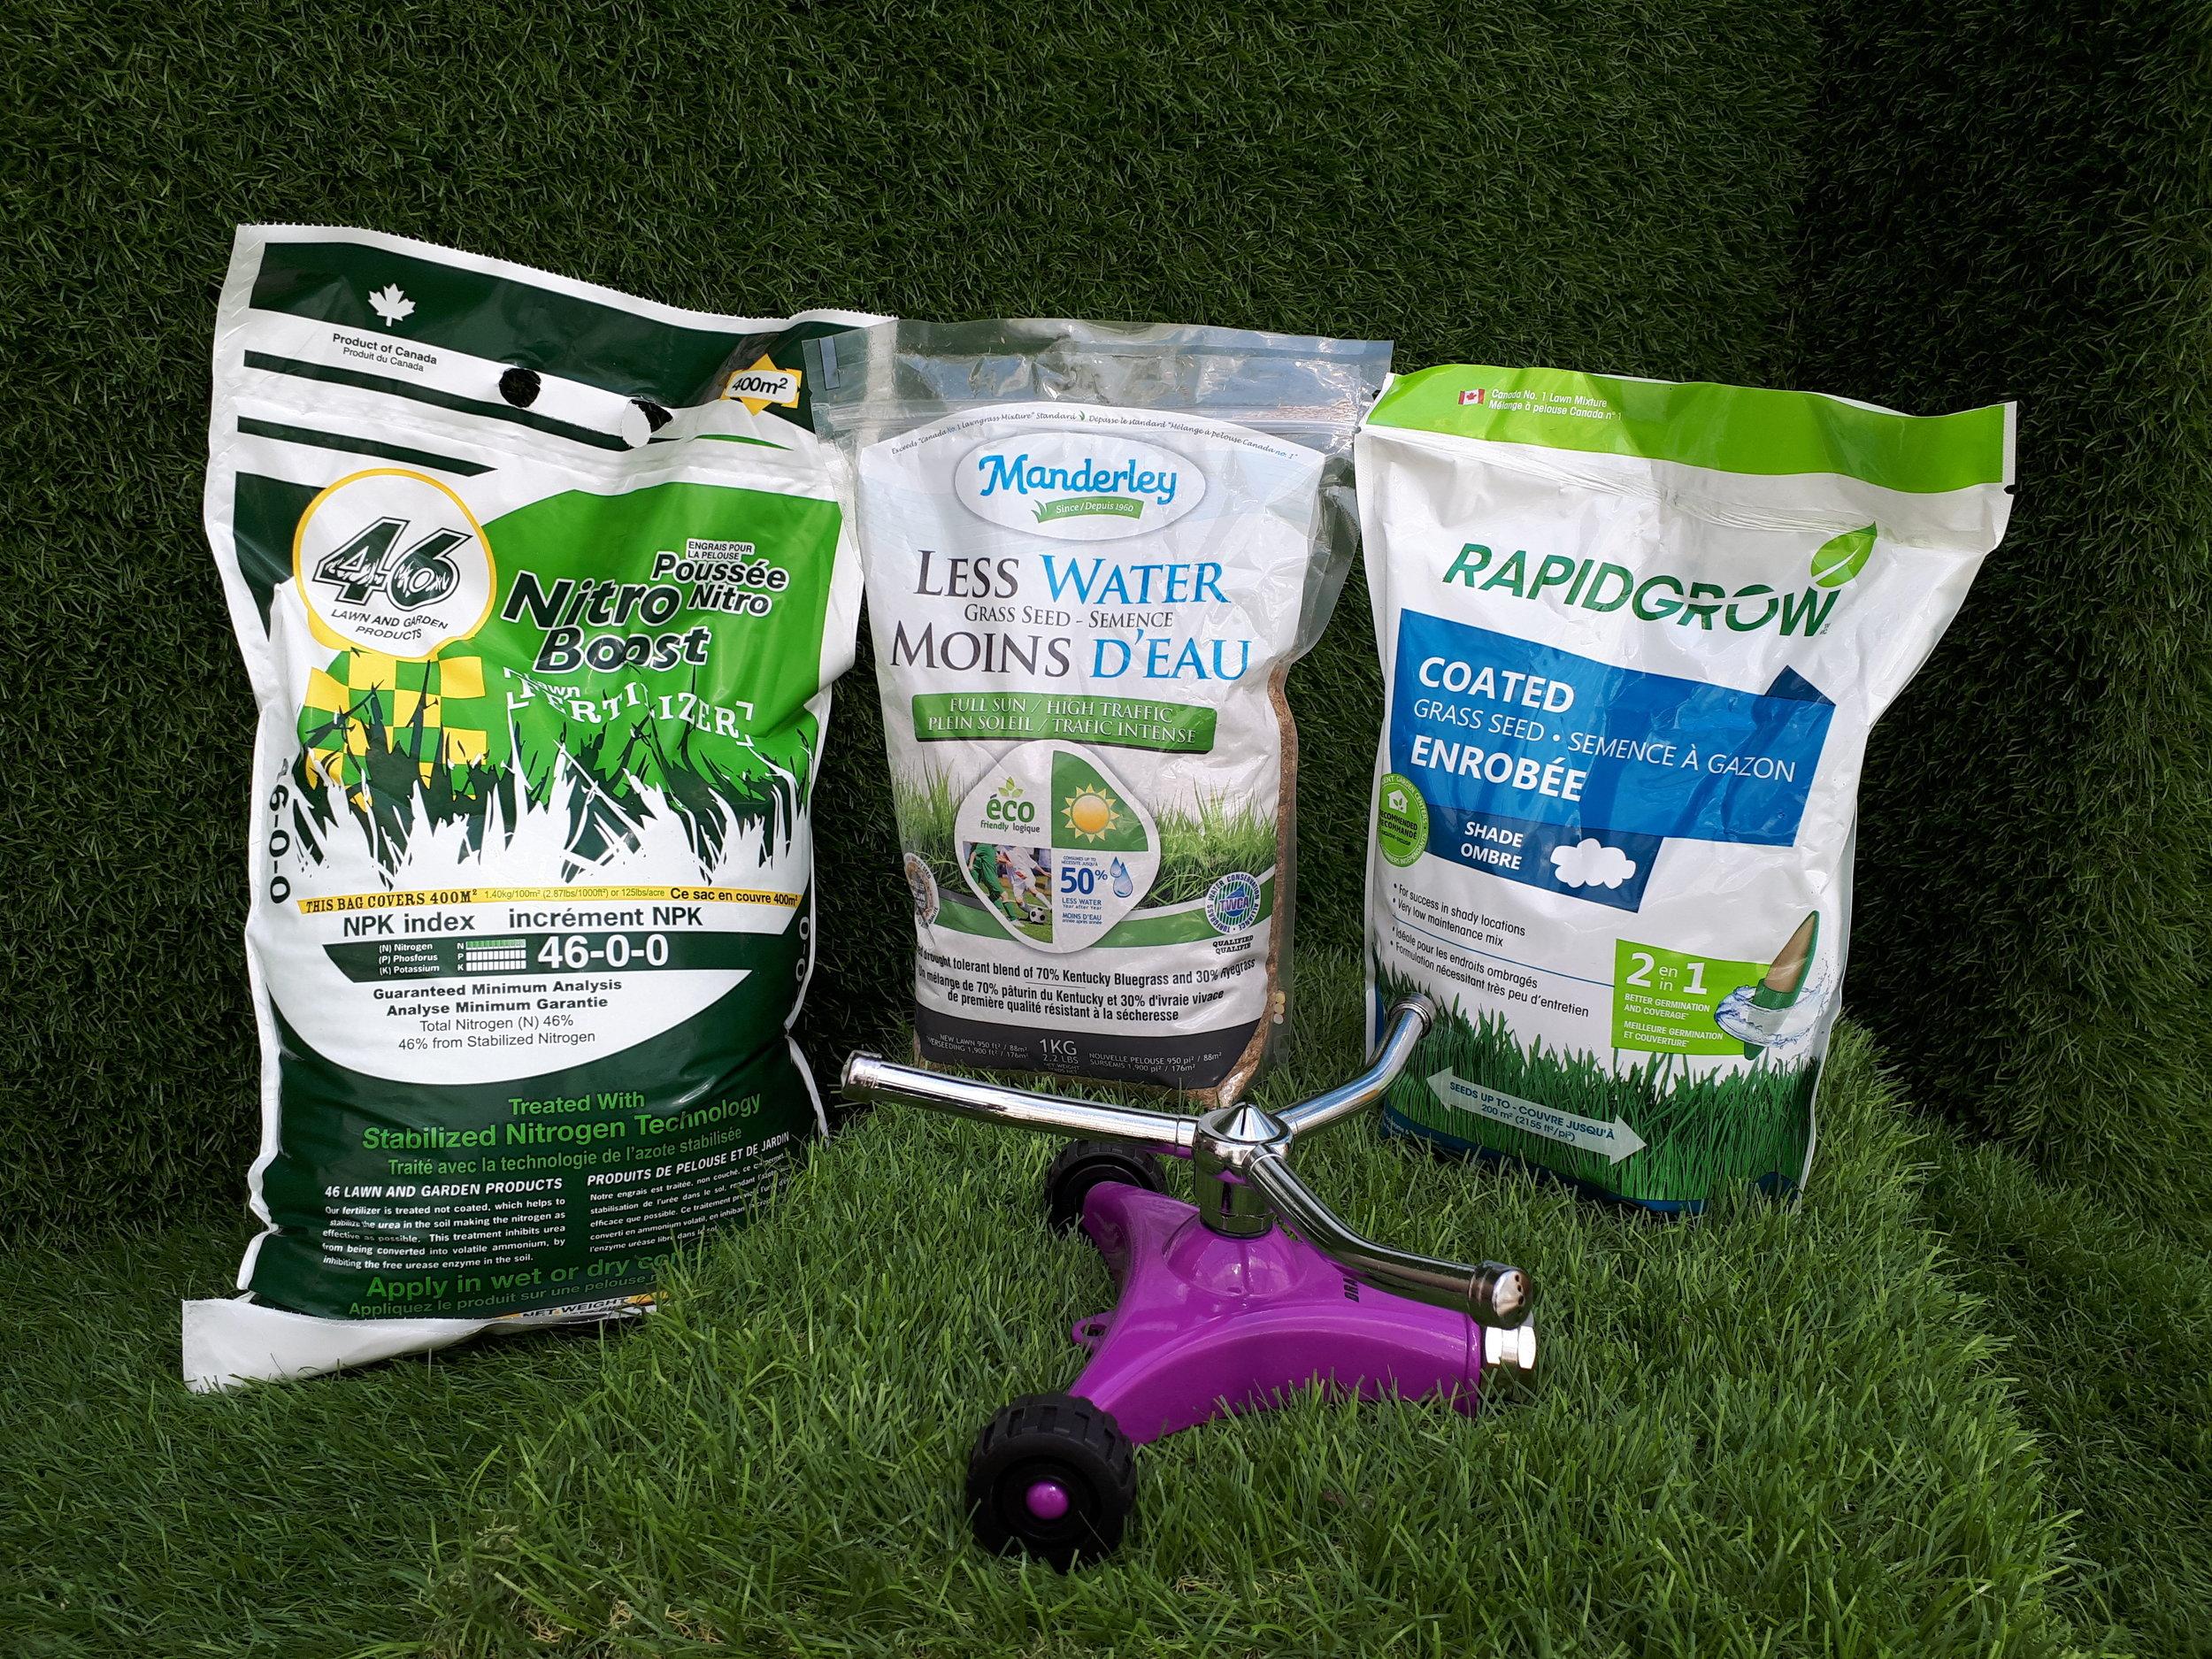 Nitro Boost Fertilizer, Manderley's Drought Tolerant Grass Seeds, and Rapidgrow's Shade Tolerant Grass Seed.